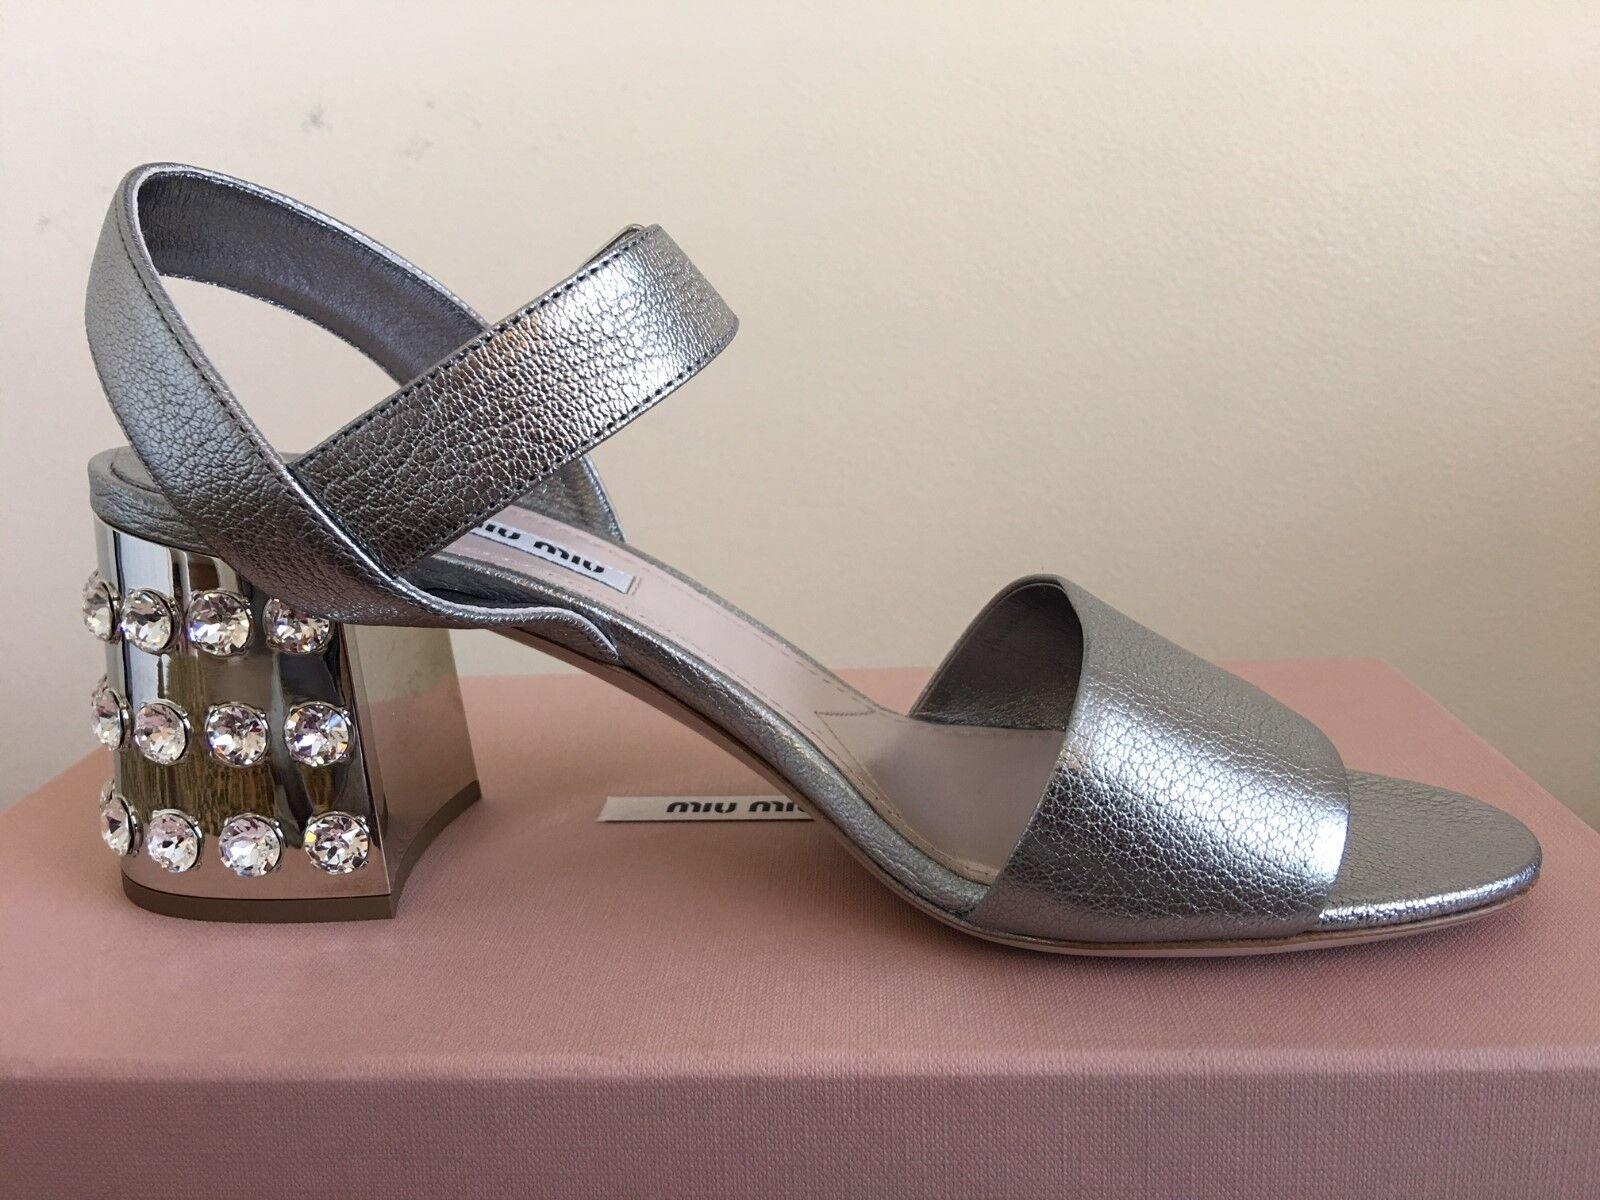 MIU MIU Embellished Heel Metallic leather ankle-strap sandals NIB 950  950 NIB 78b9c5